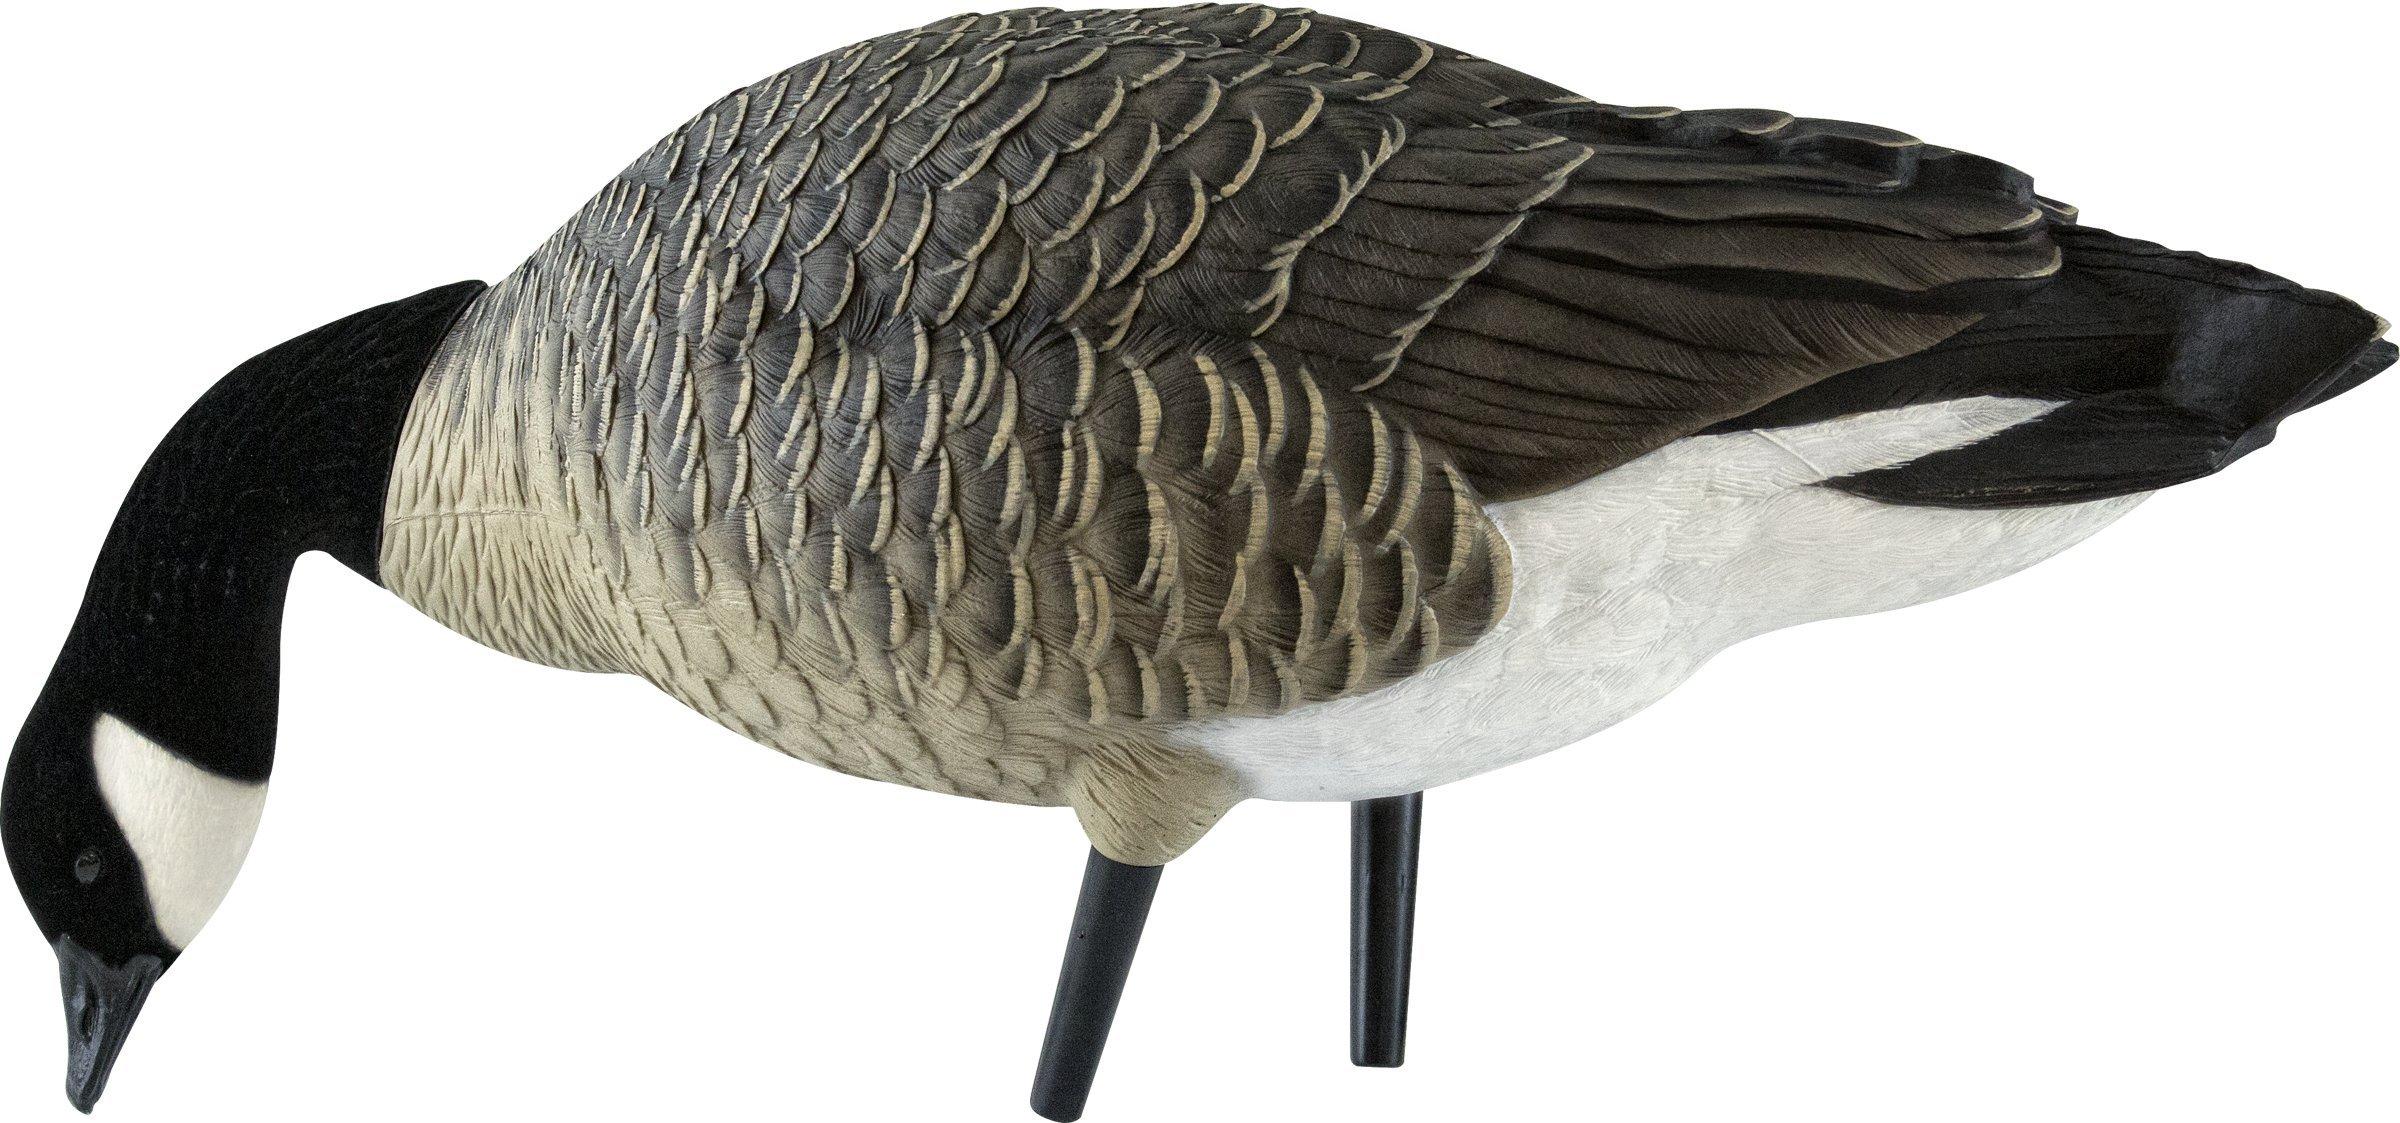 Avian-X Flocked Feeder Lesser Goose Decoys 6 pack by Avian-X (Image #3)